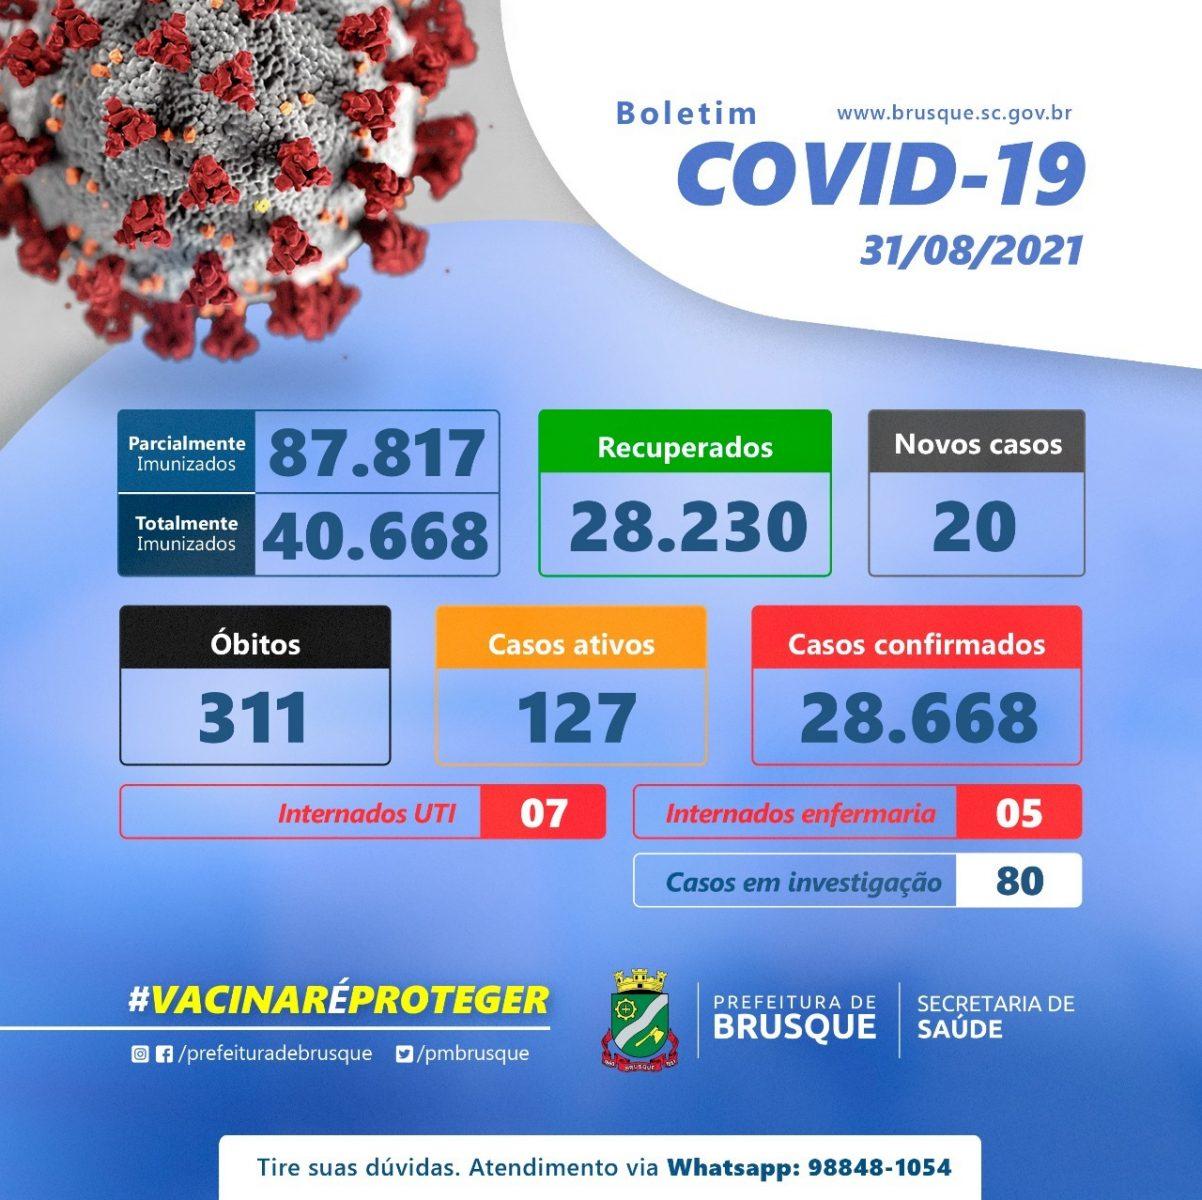 Covid-19: Confira o boletim epidemiológico desta terça-feira (31)